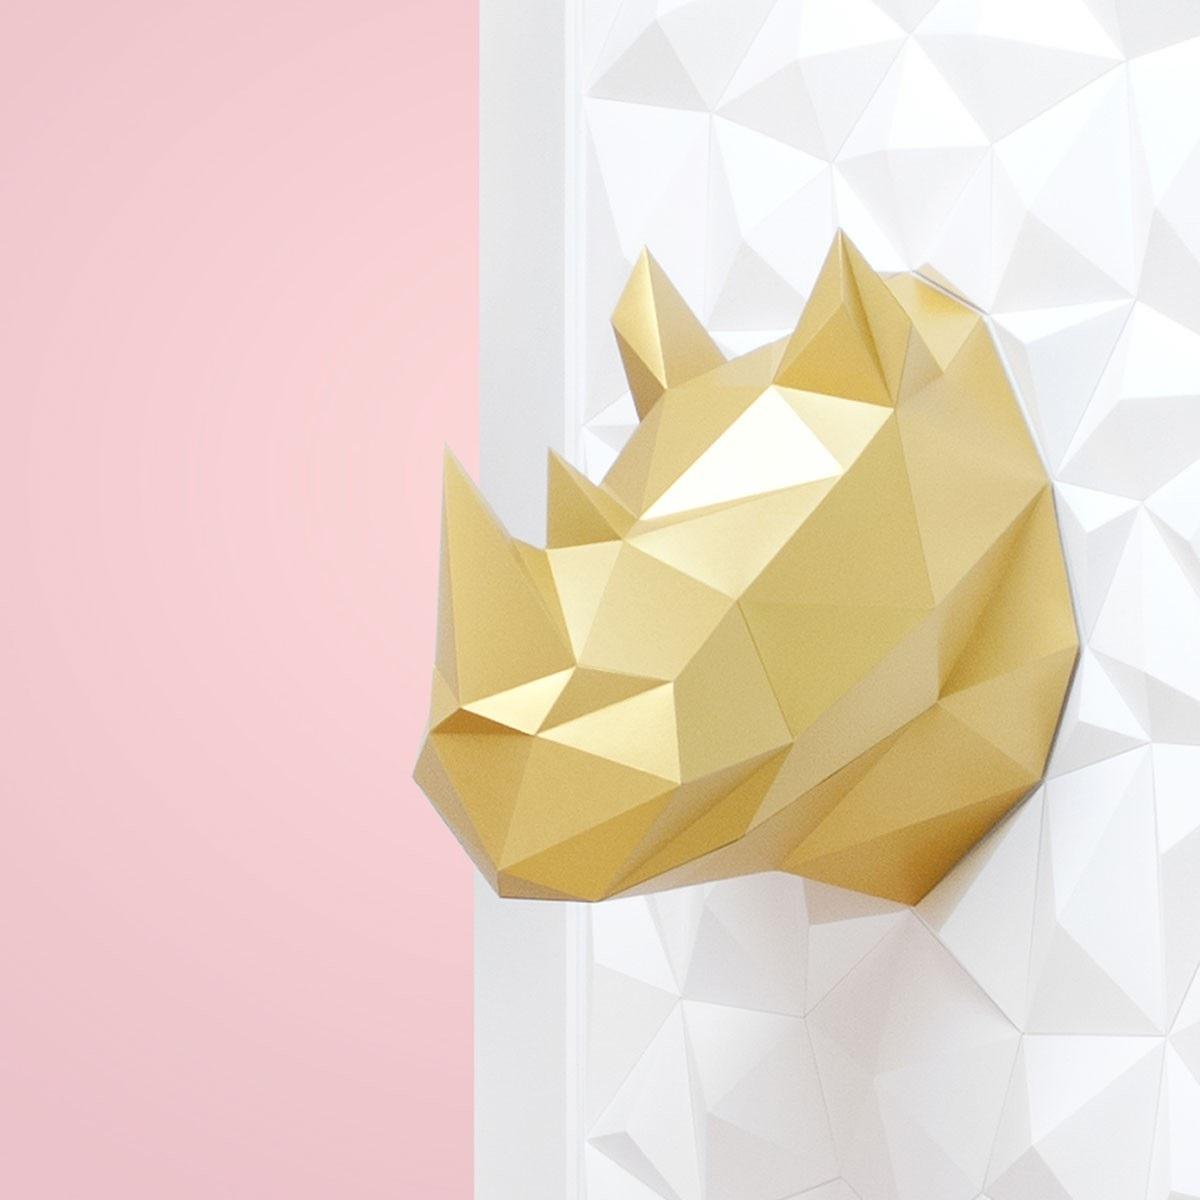 Trophee Façon Origami